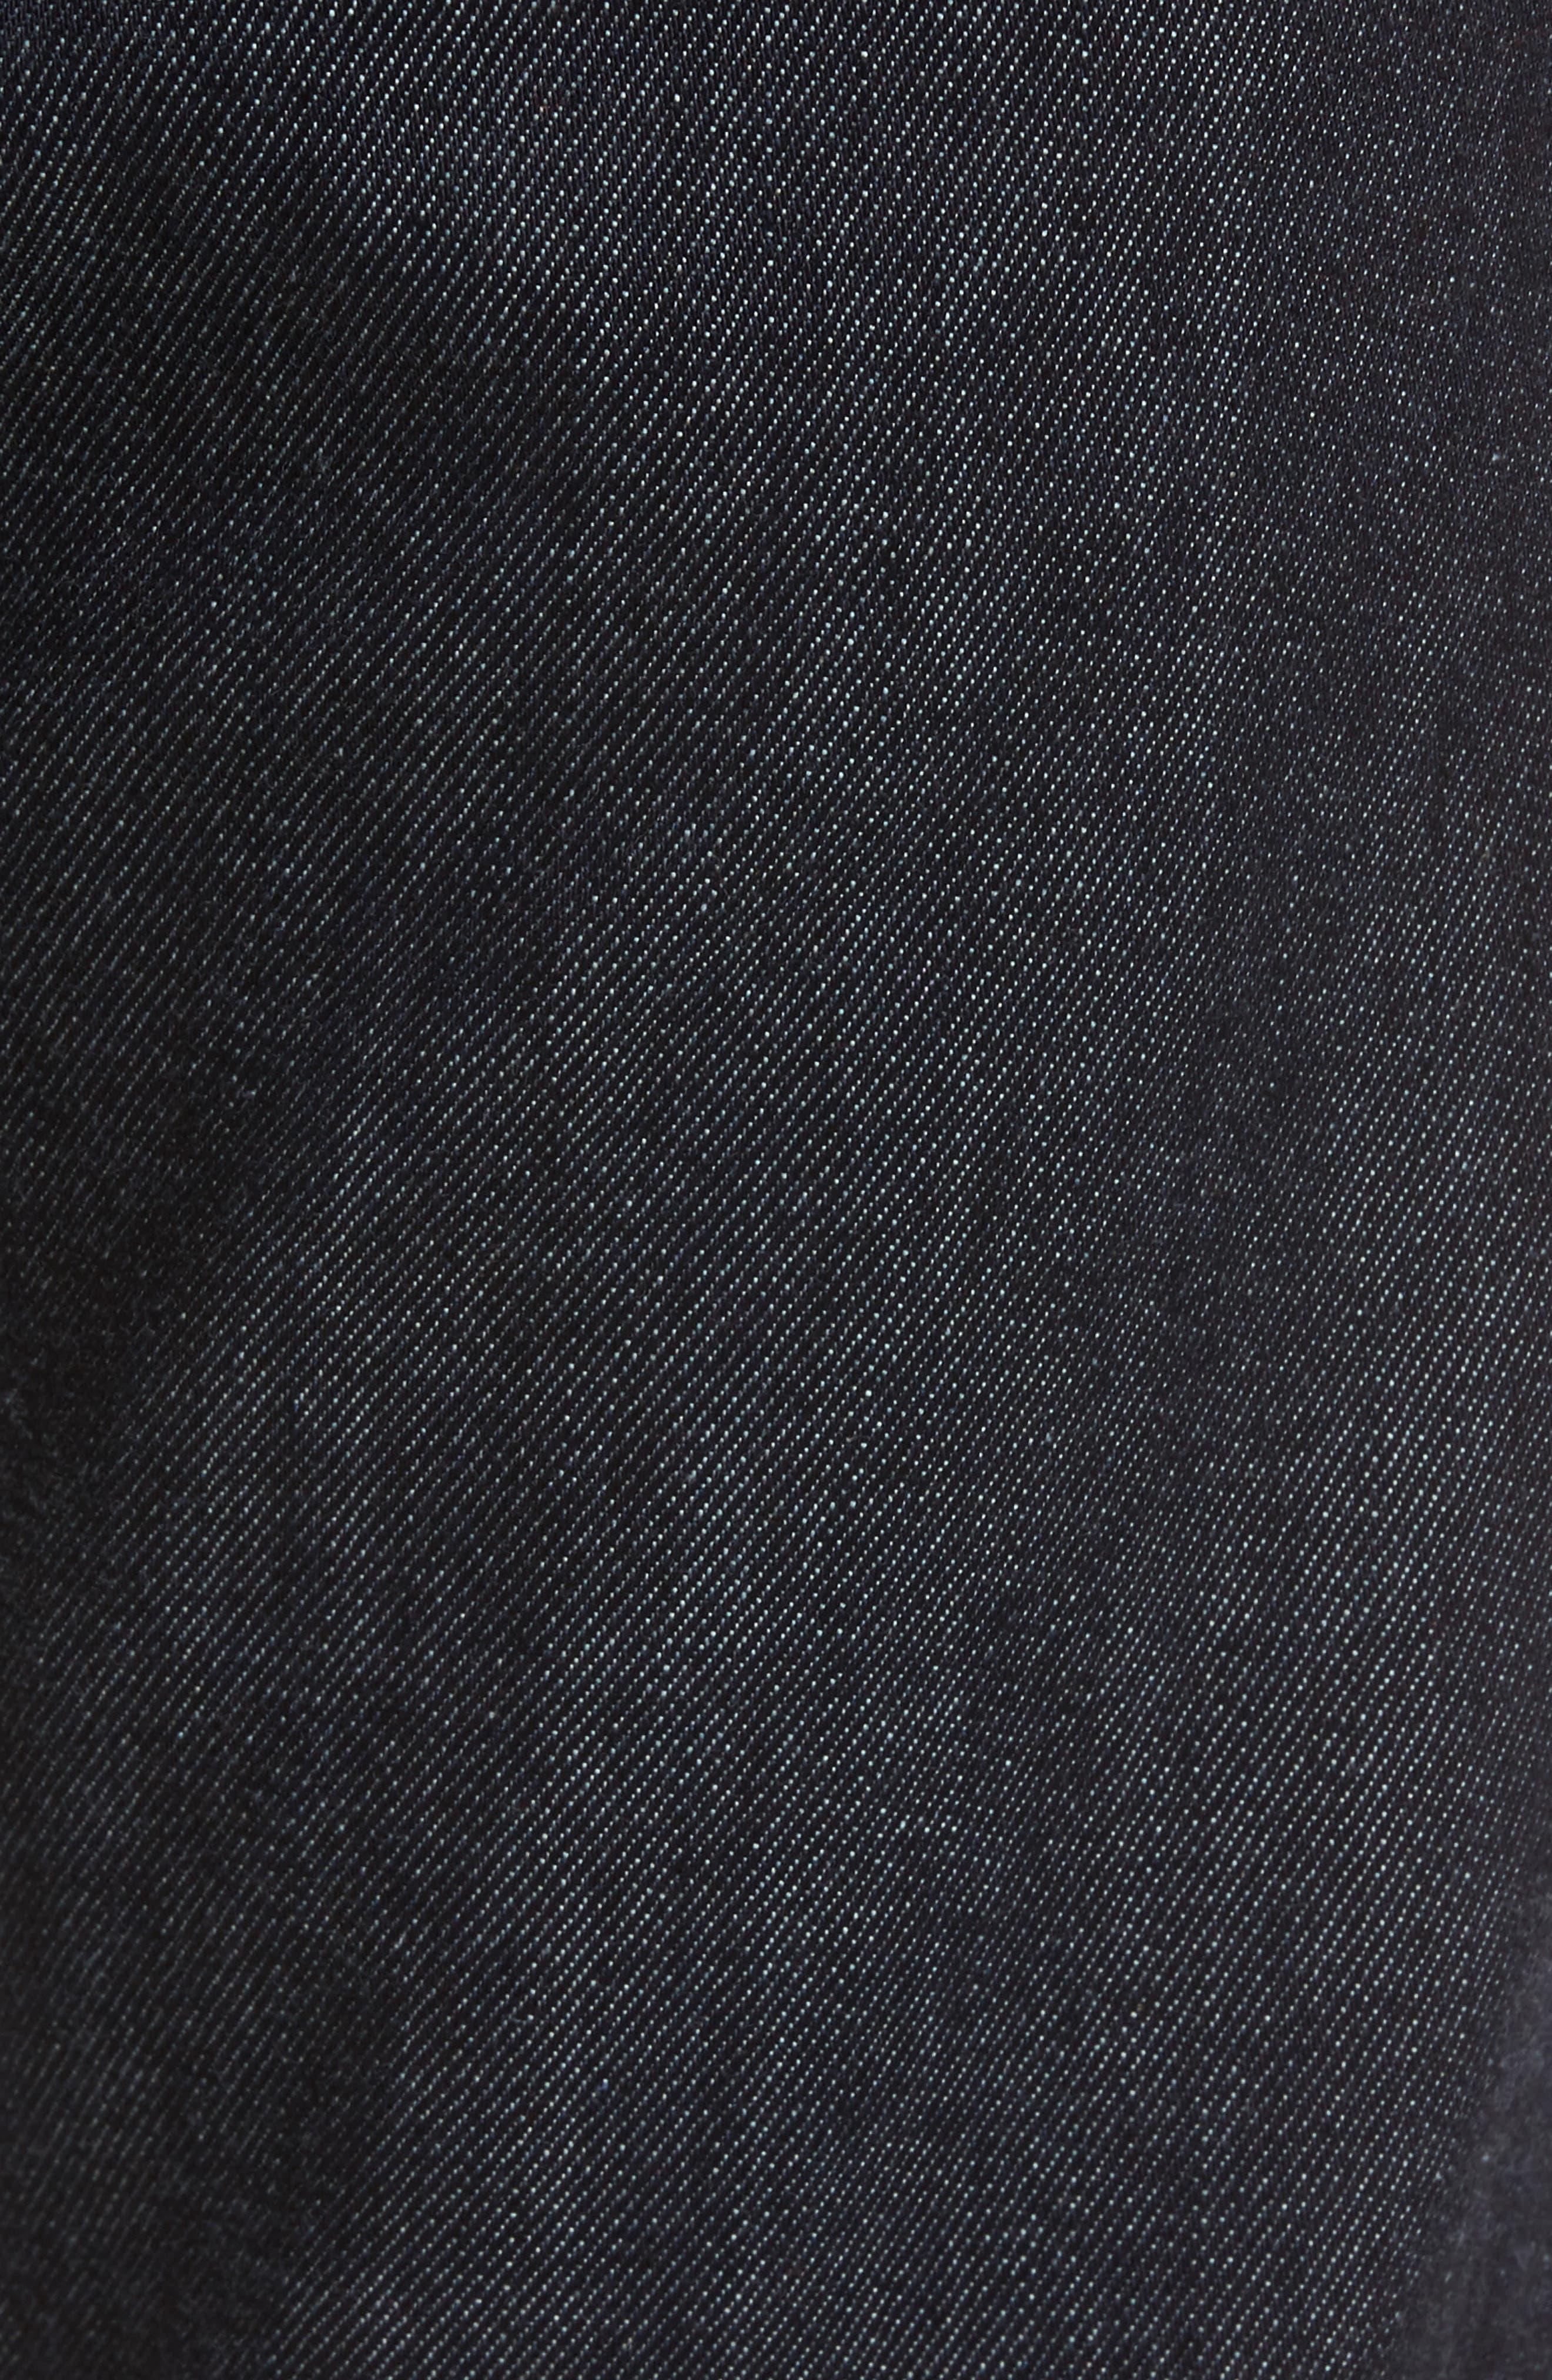 Ives Straight Leg Jeans,                             Alternate thumbnail 5, color,                             Modular